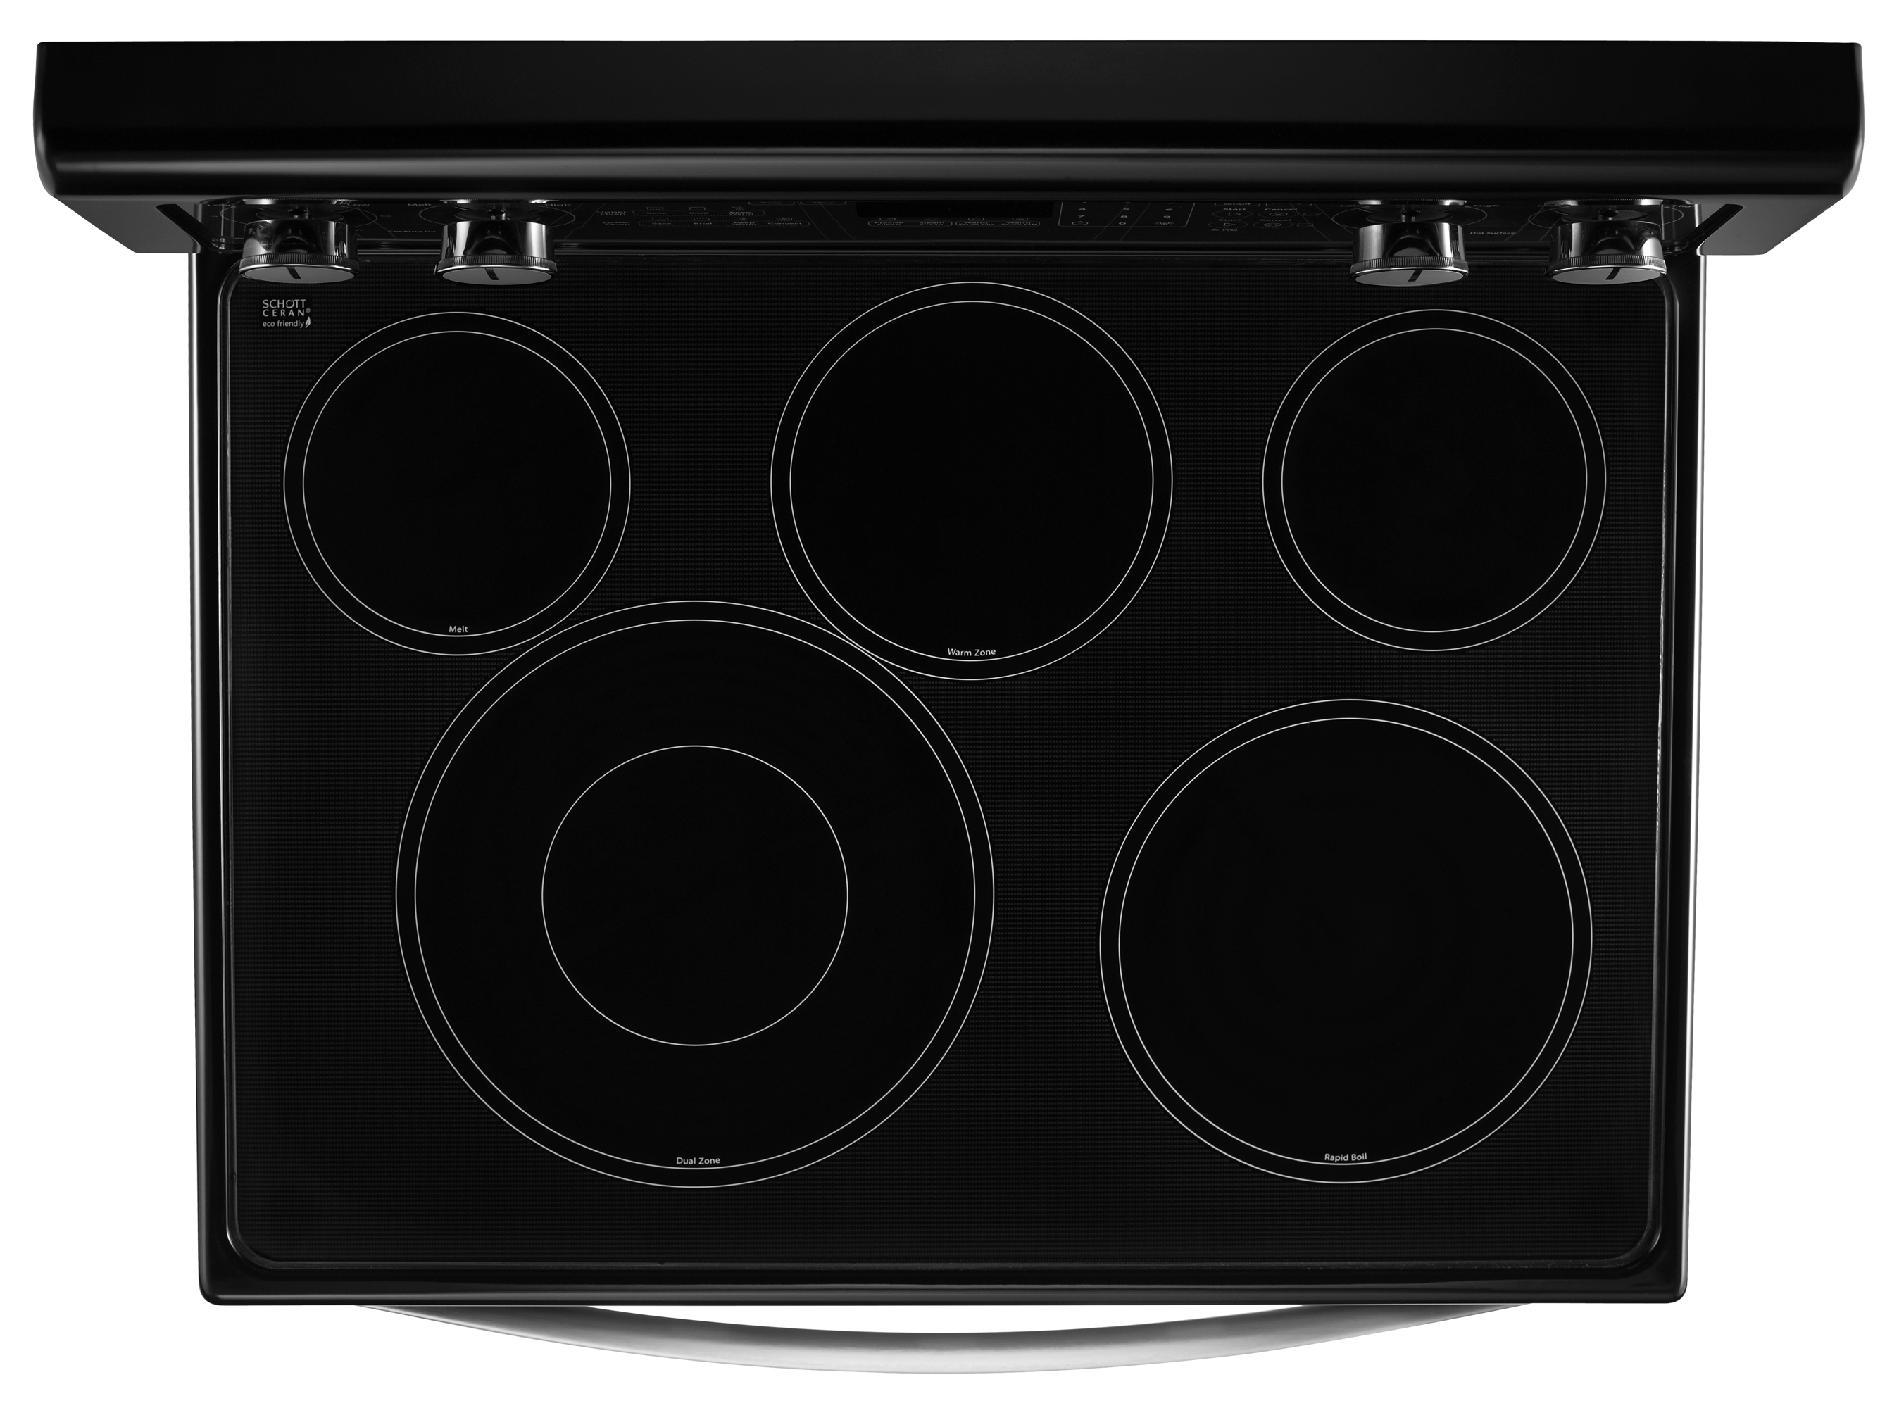 "Whirlpool WGE755C0BE 30"" Electric Range w/ AccuBake® System – Black Ice"